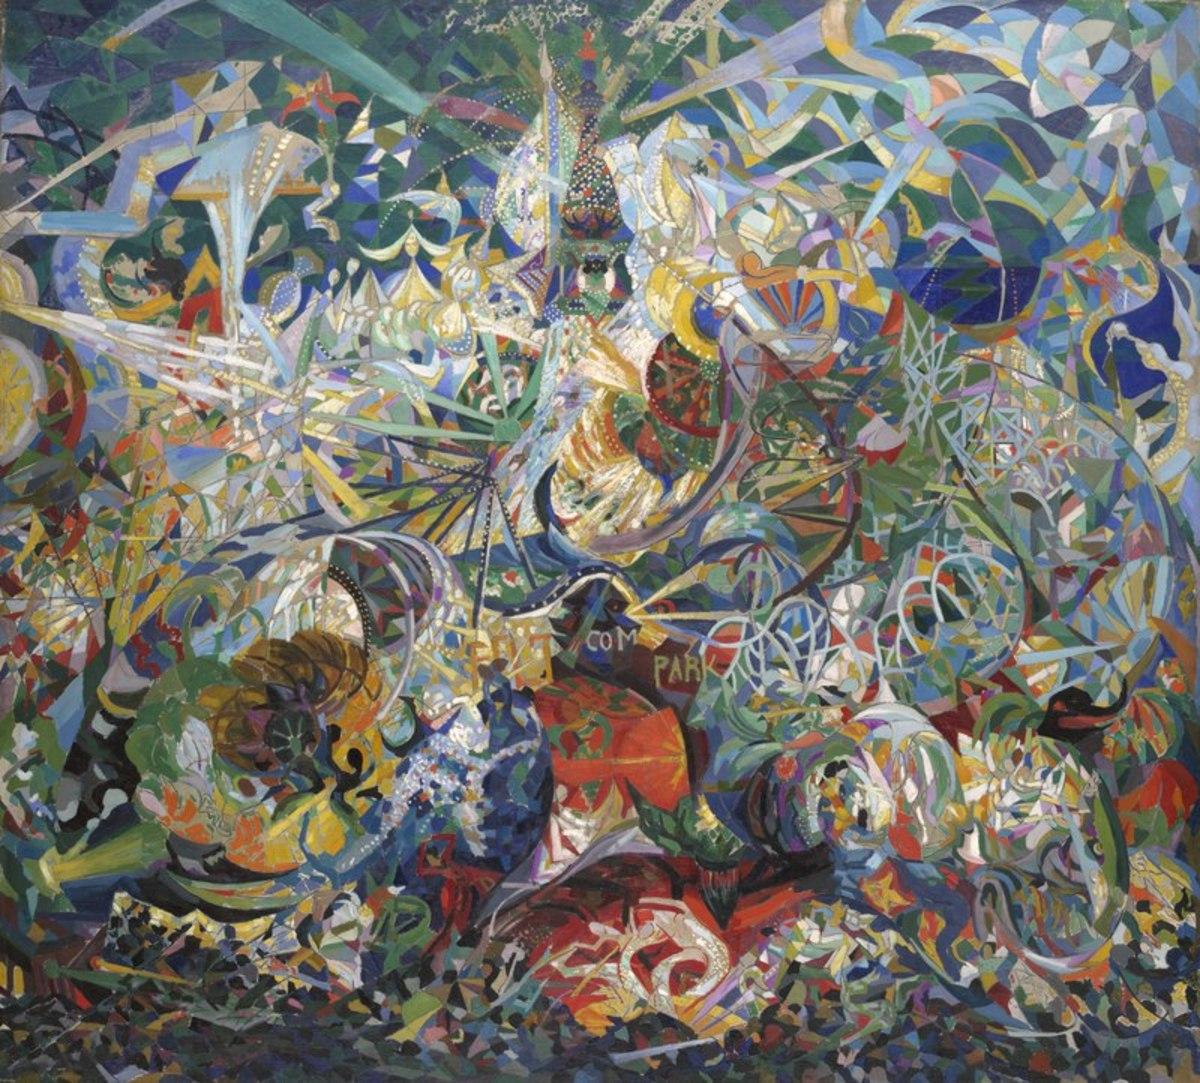 Battle of the Lights, Coney Island by Joseph Stella